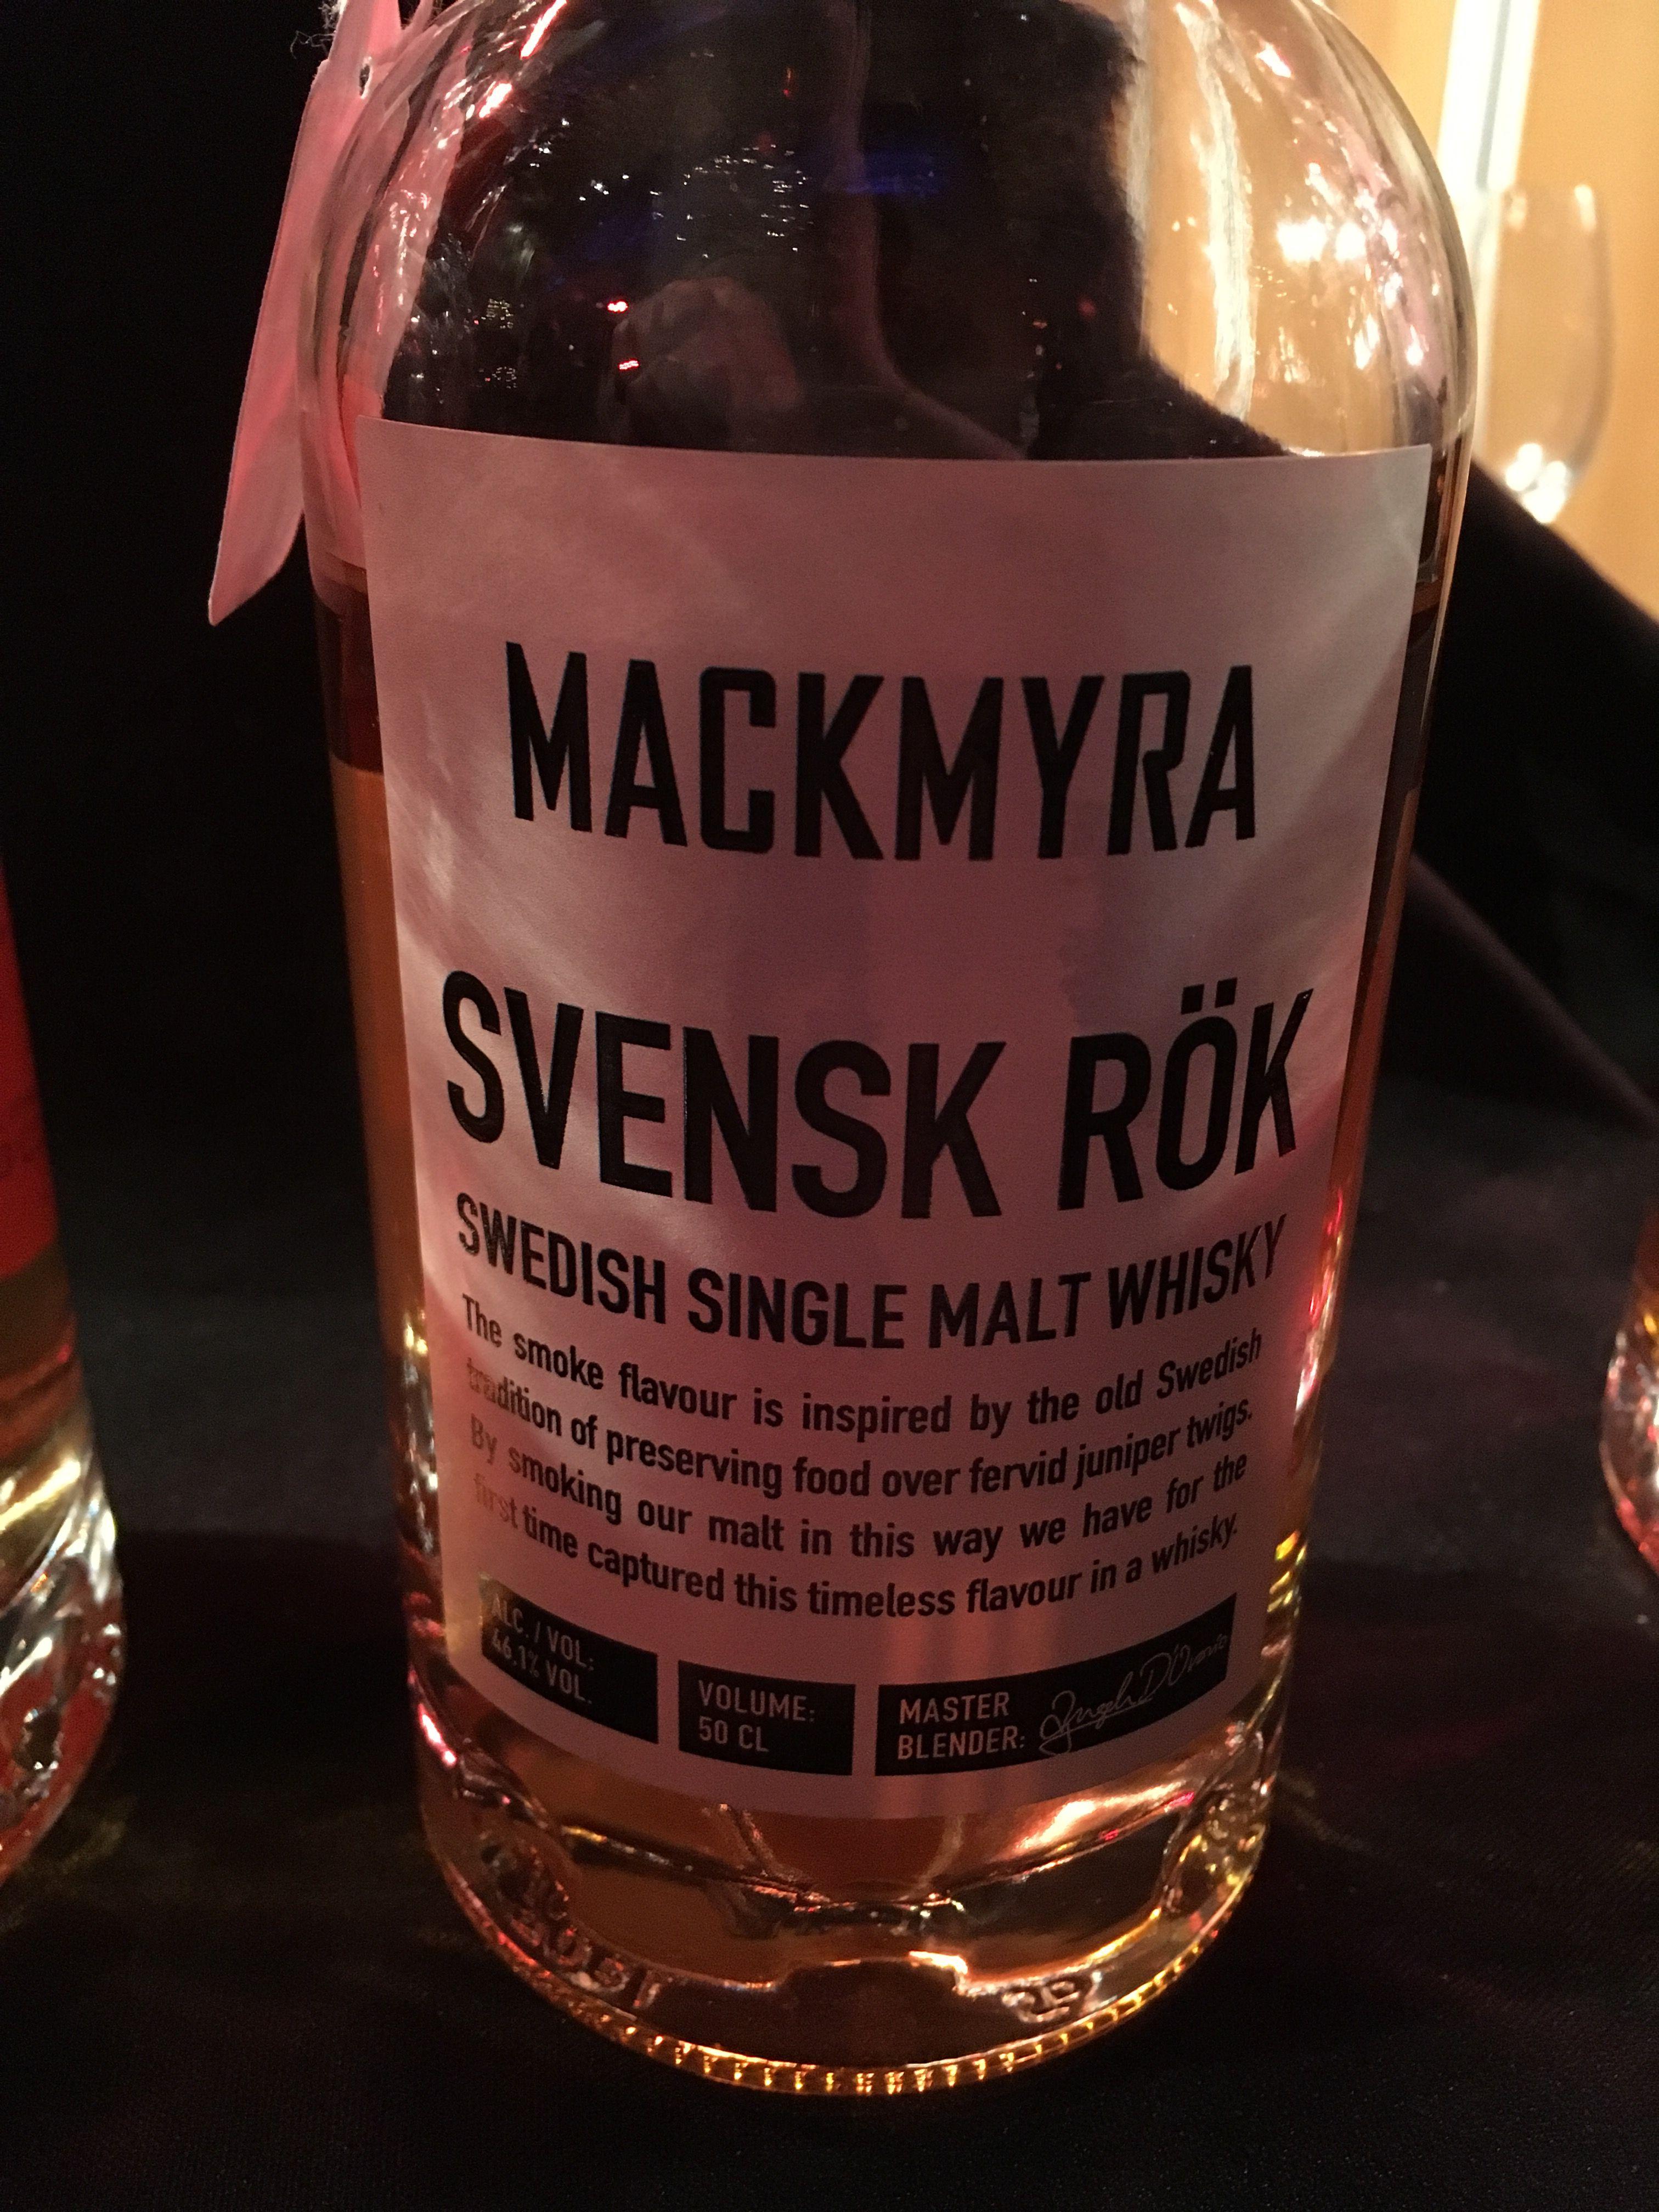 Pin By Dakota Hastings On Whiskey Tasted Whiskey Tasting Whisky Single Malt